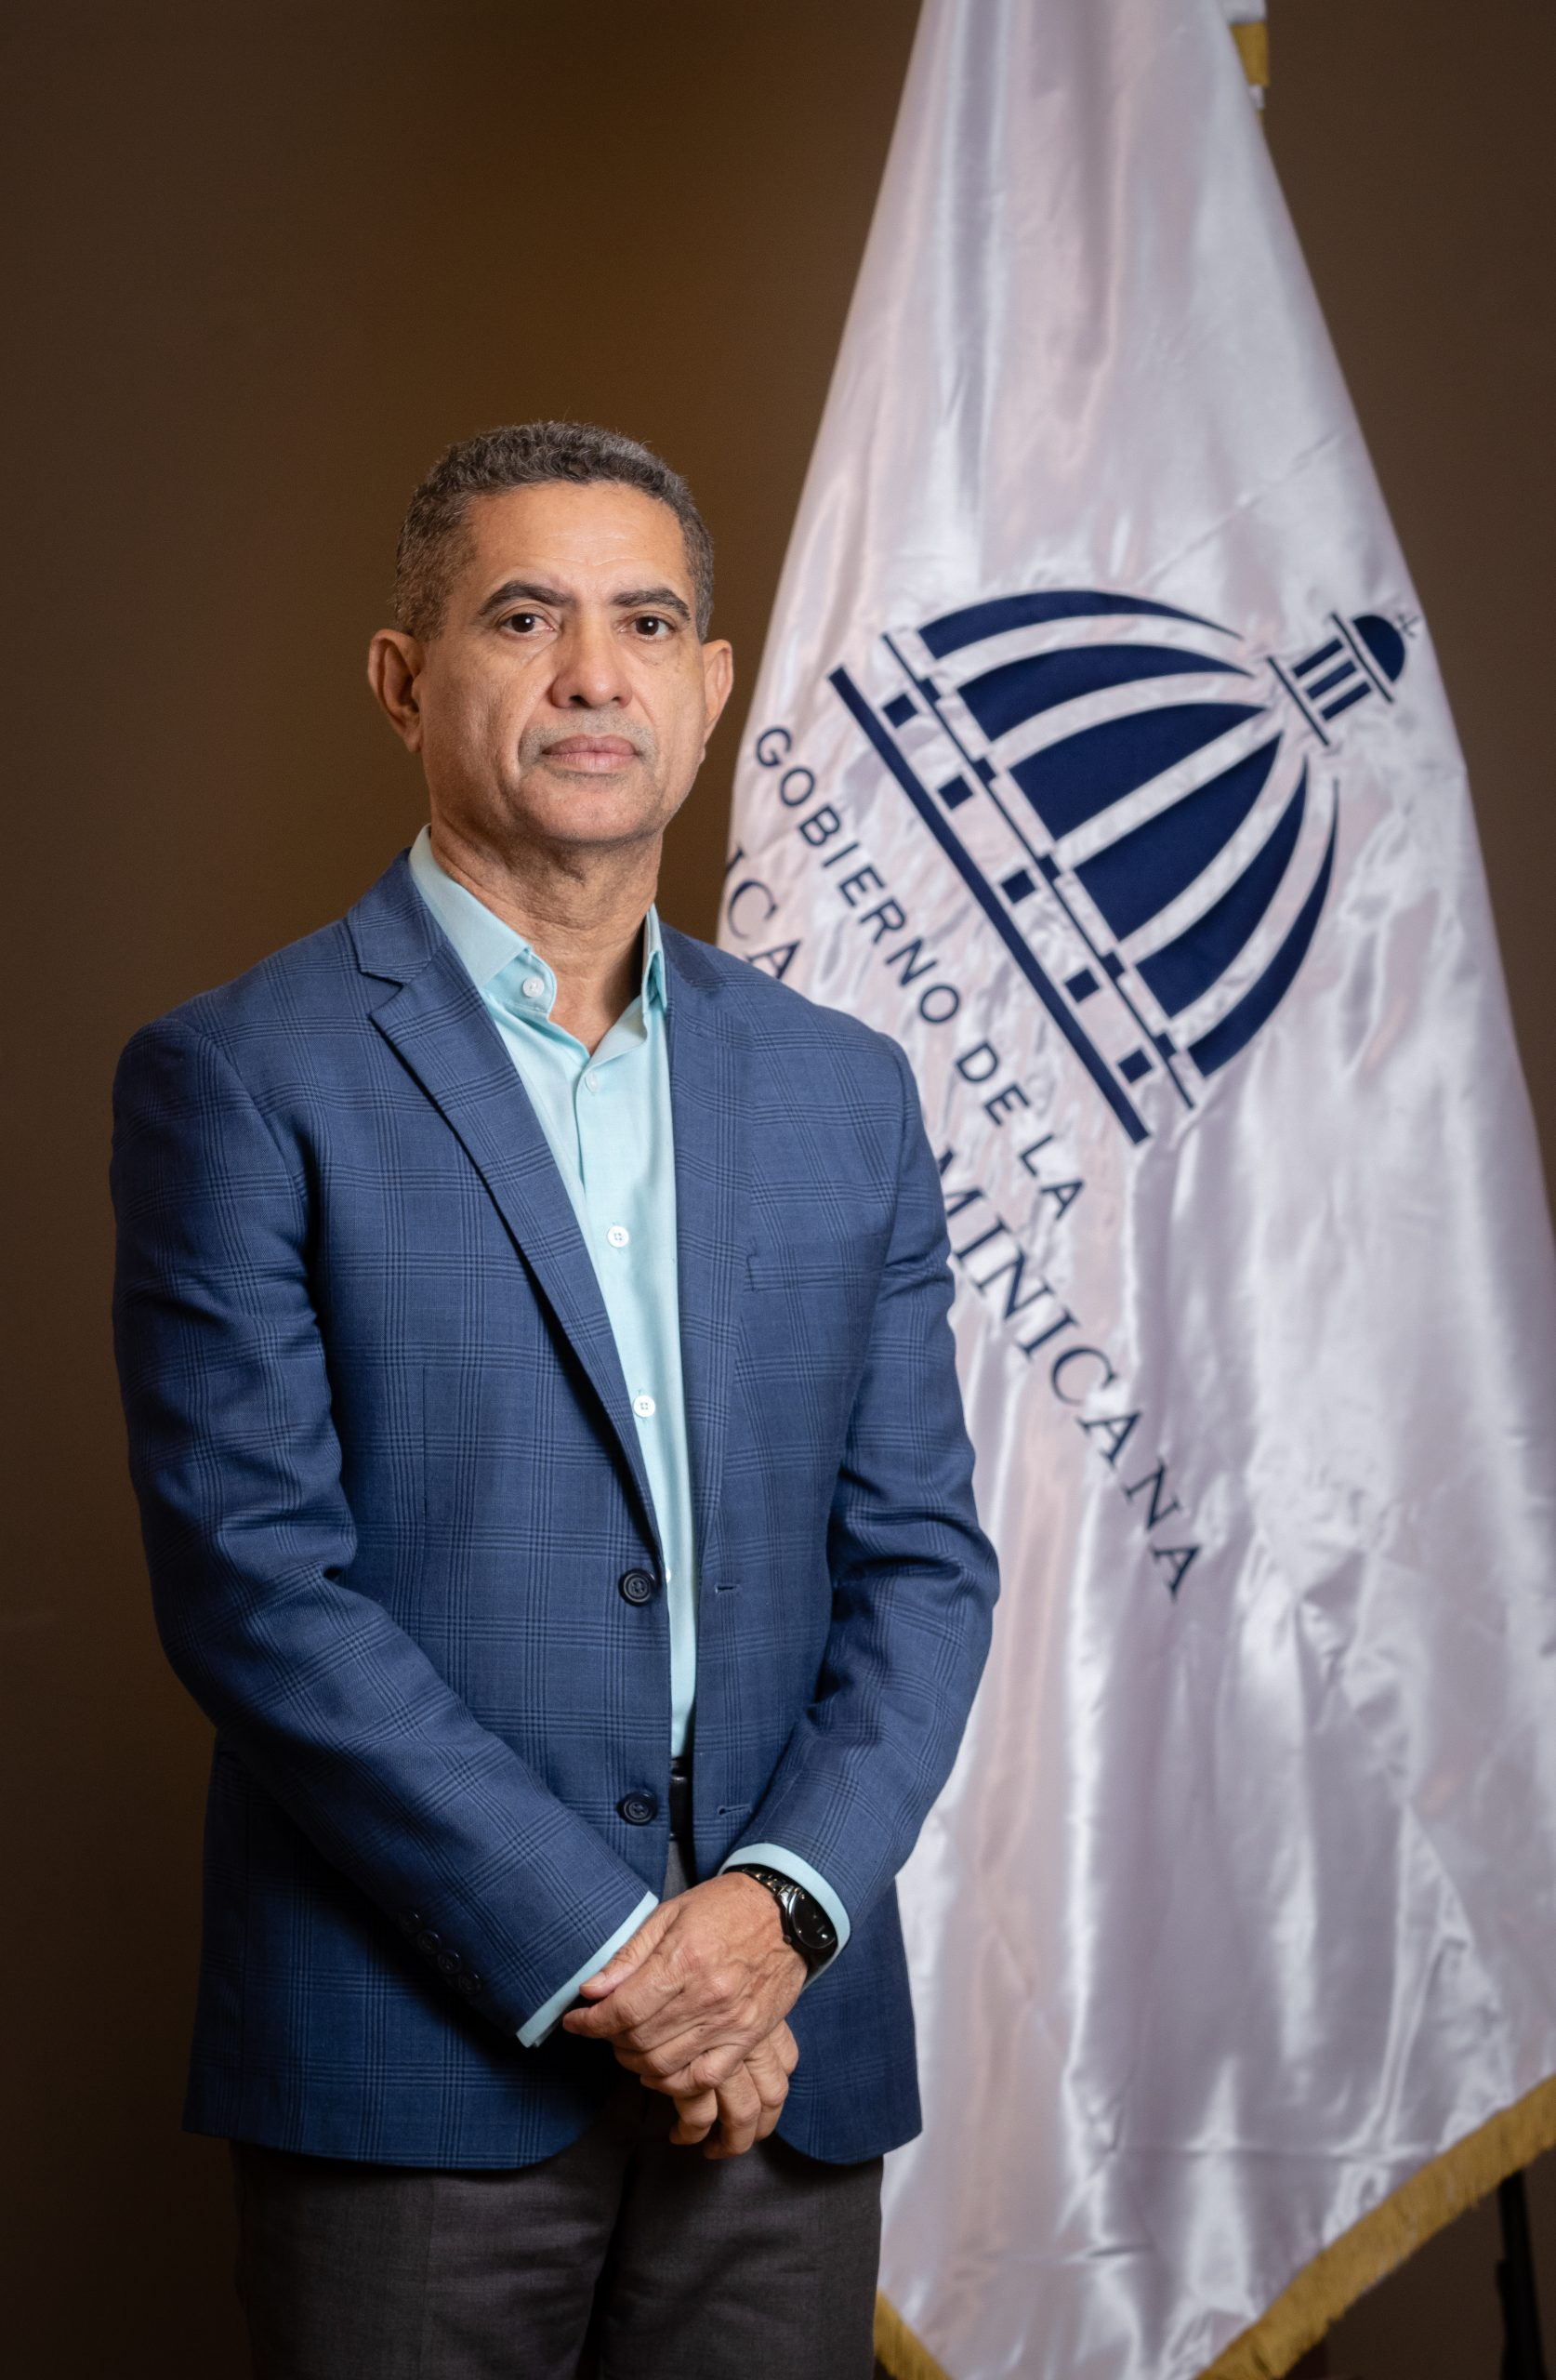 Kennedy Vargas